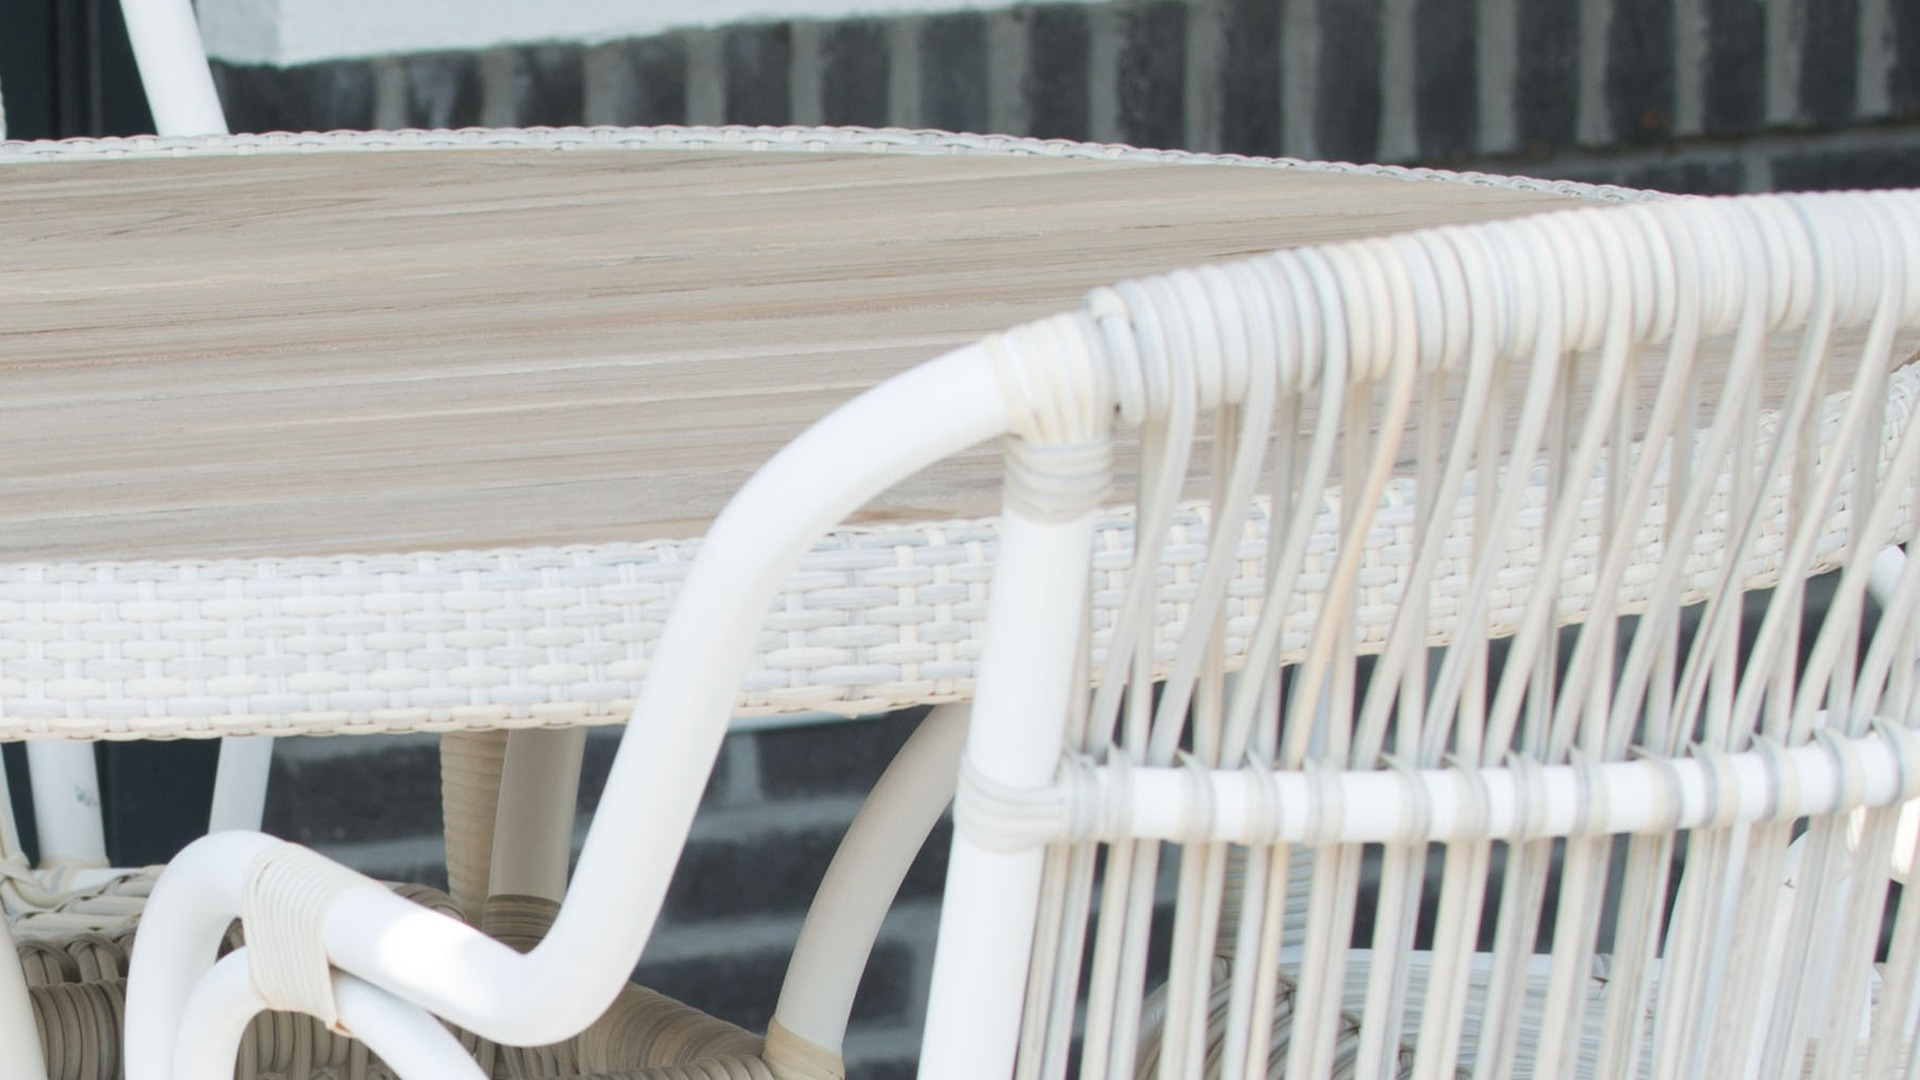 Onwijs 4 Seasons Outdoor Loire Tuinset Retro Provance — Tuinmeubelkorting ZQ-52